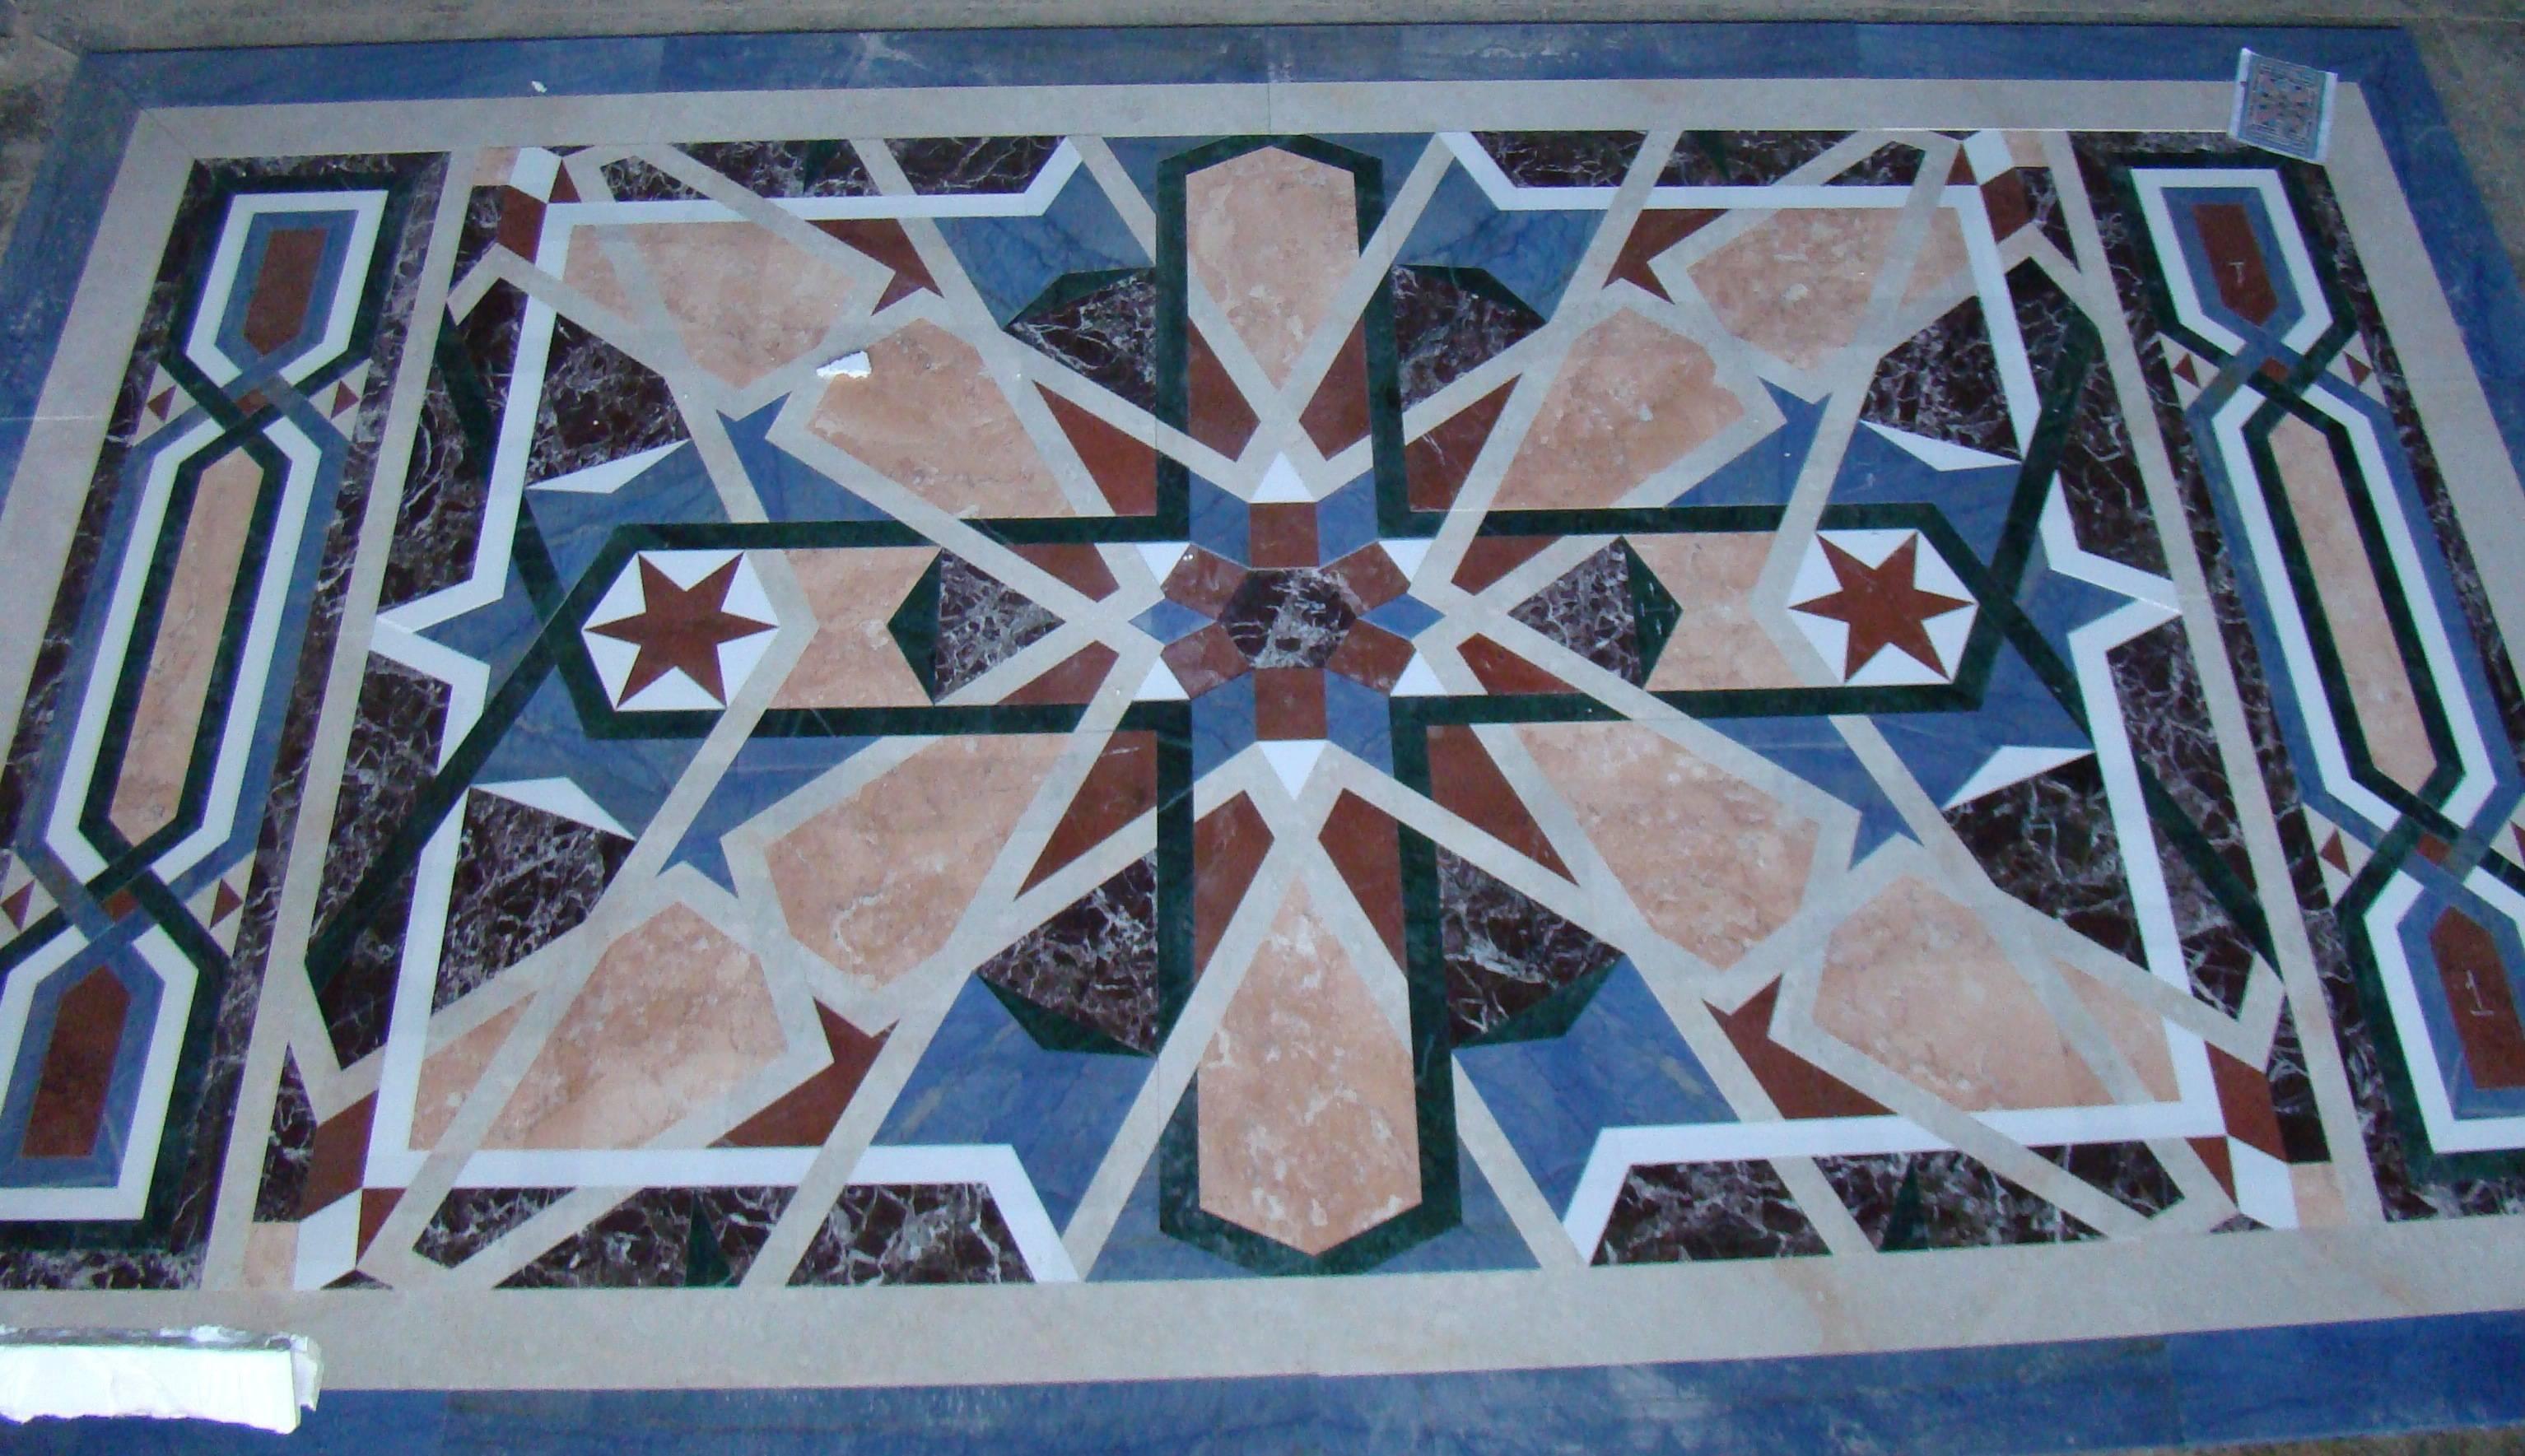 Мозаичное панно из мрамора-3 фото 1 — изелия и проекты от Bevers Marmyr